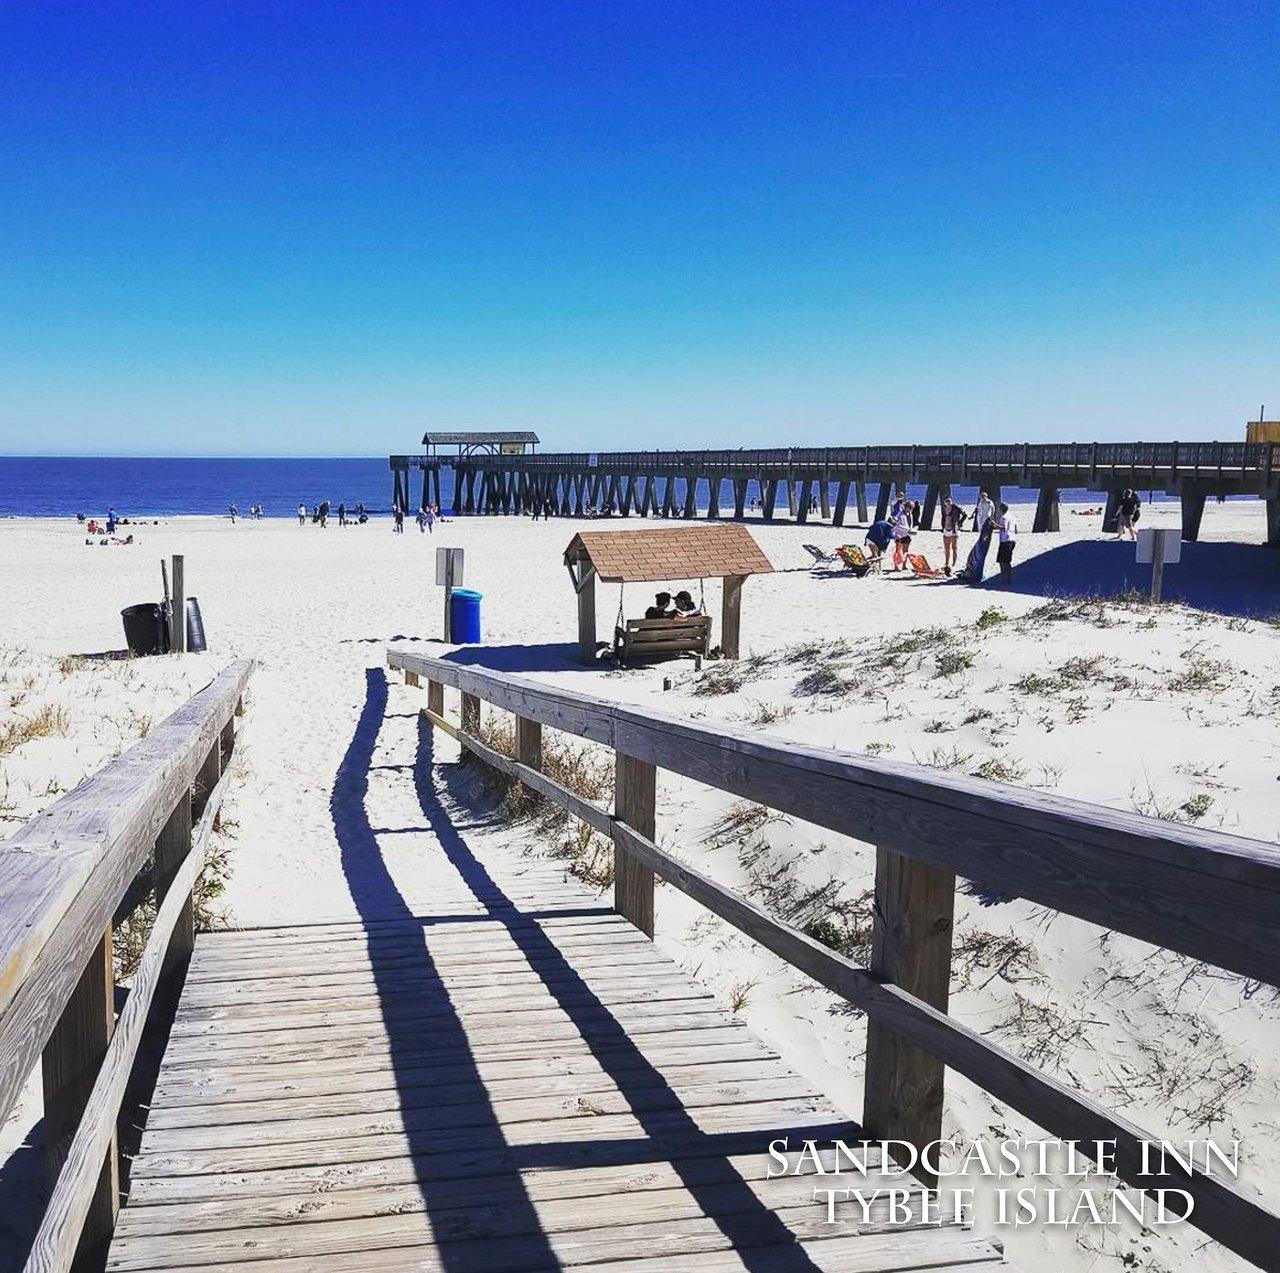 sandcastle inn 68 9 1 updated 2019 prices hotel reviews rh tripadvisor com